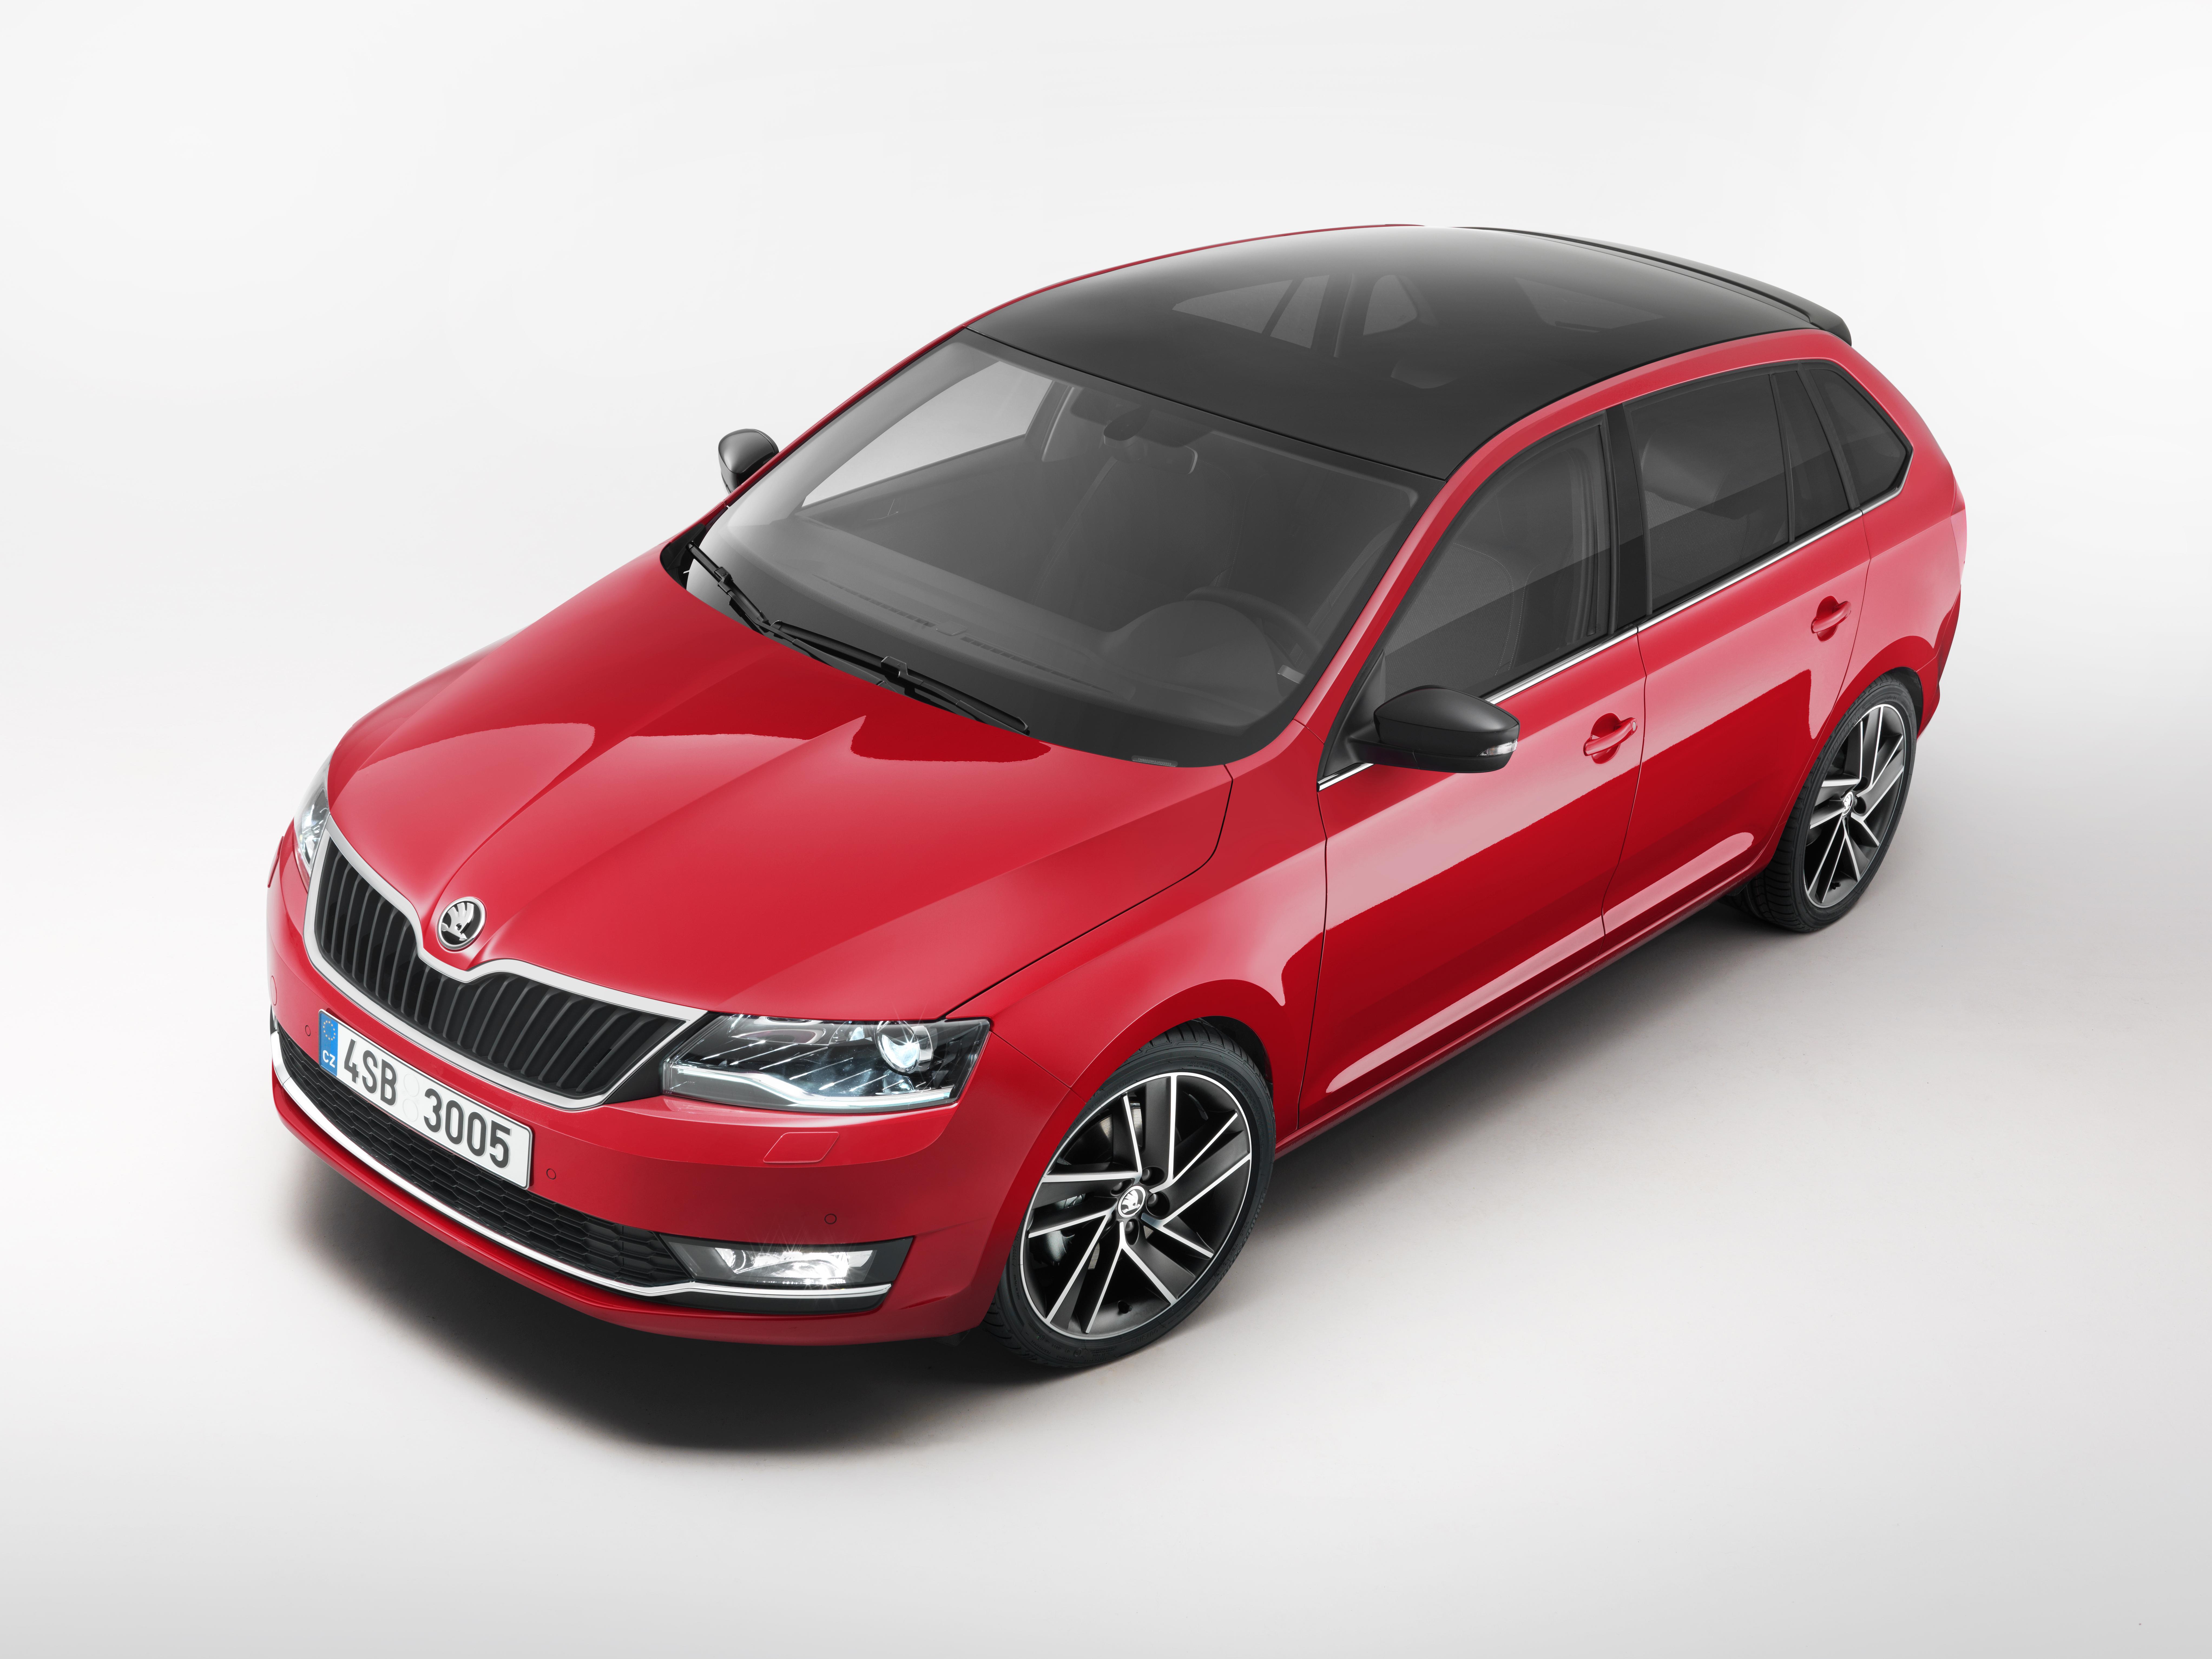 Škoda rapid and Škoda rapid spaceback optimized interior and